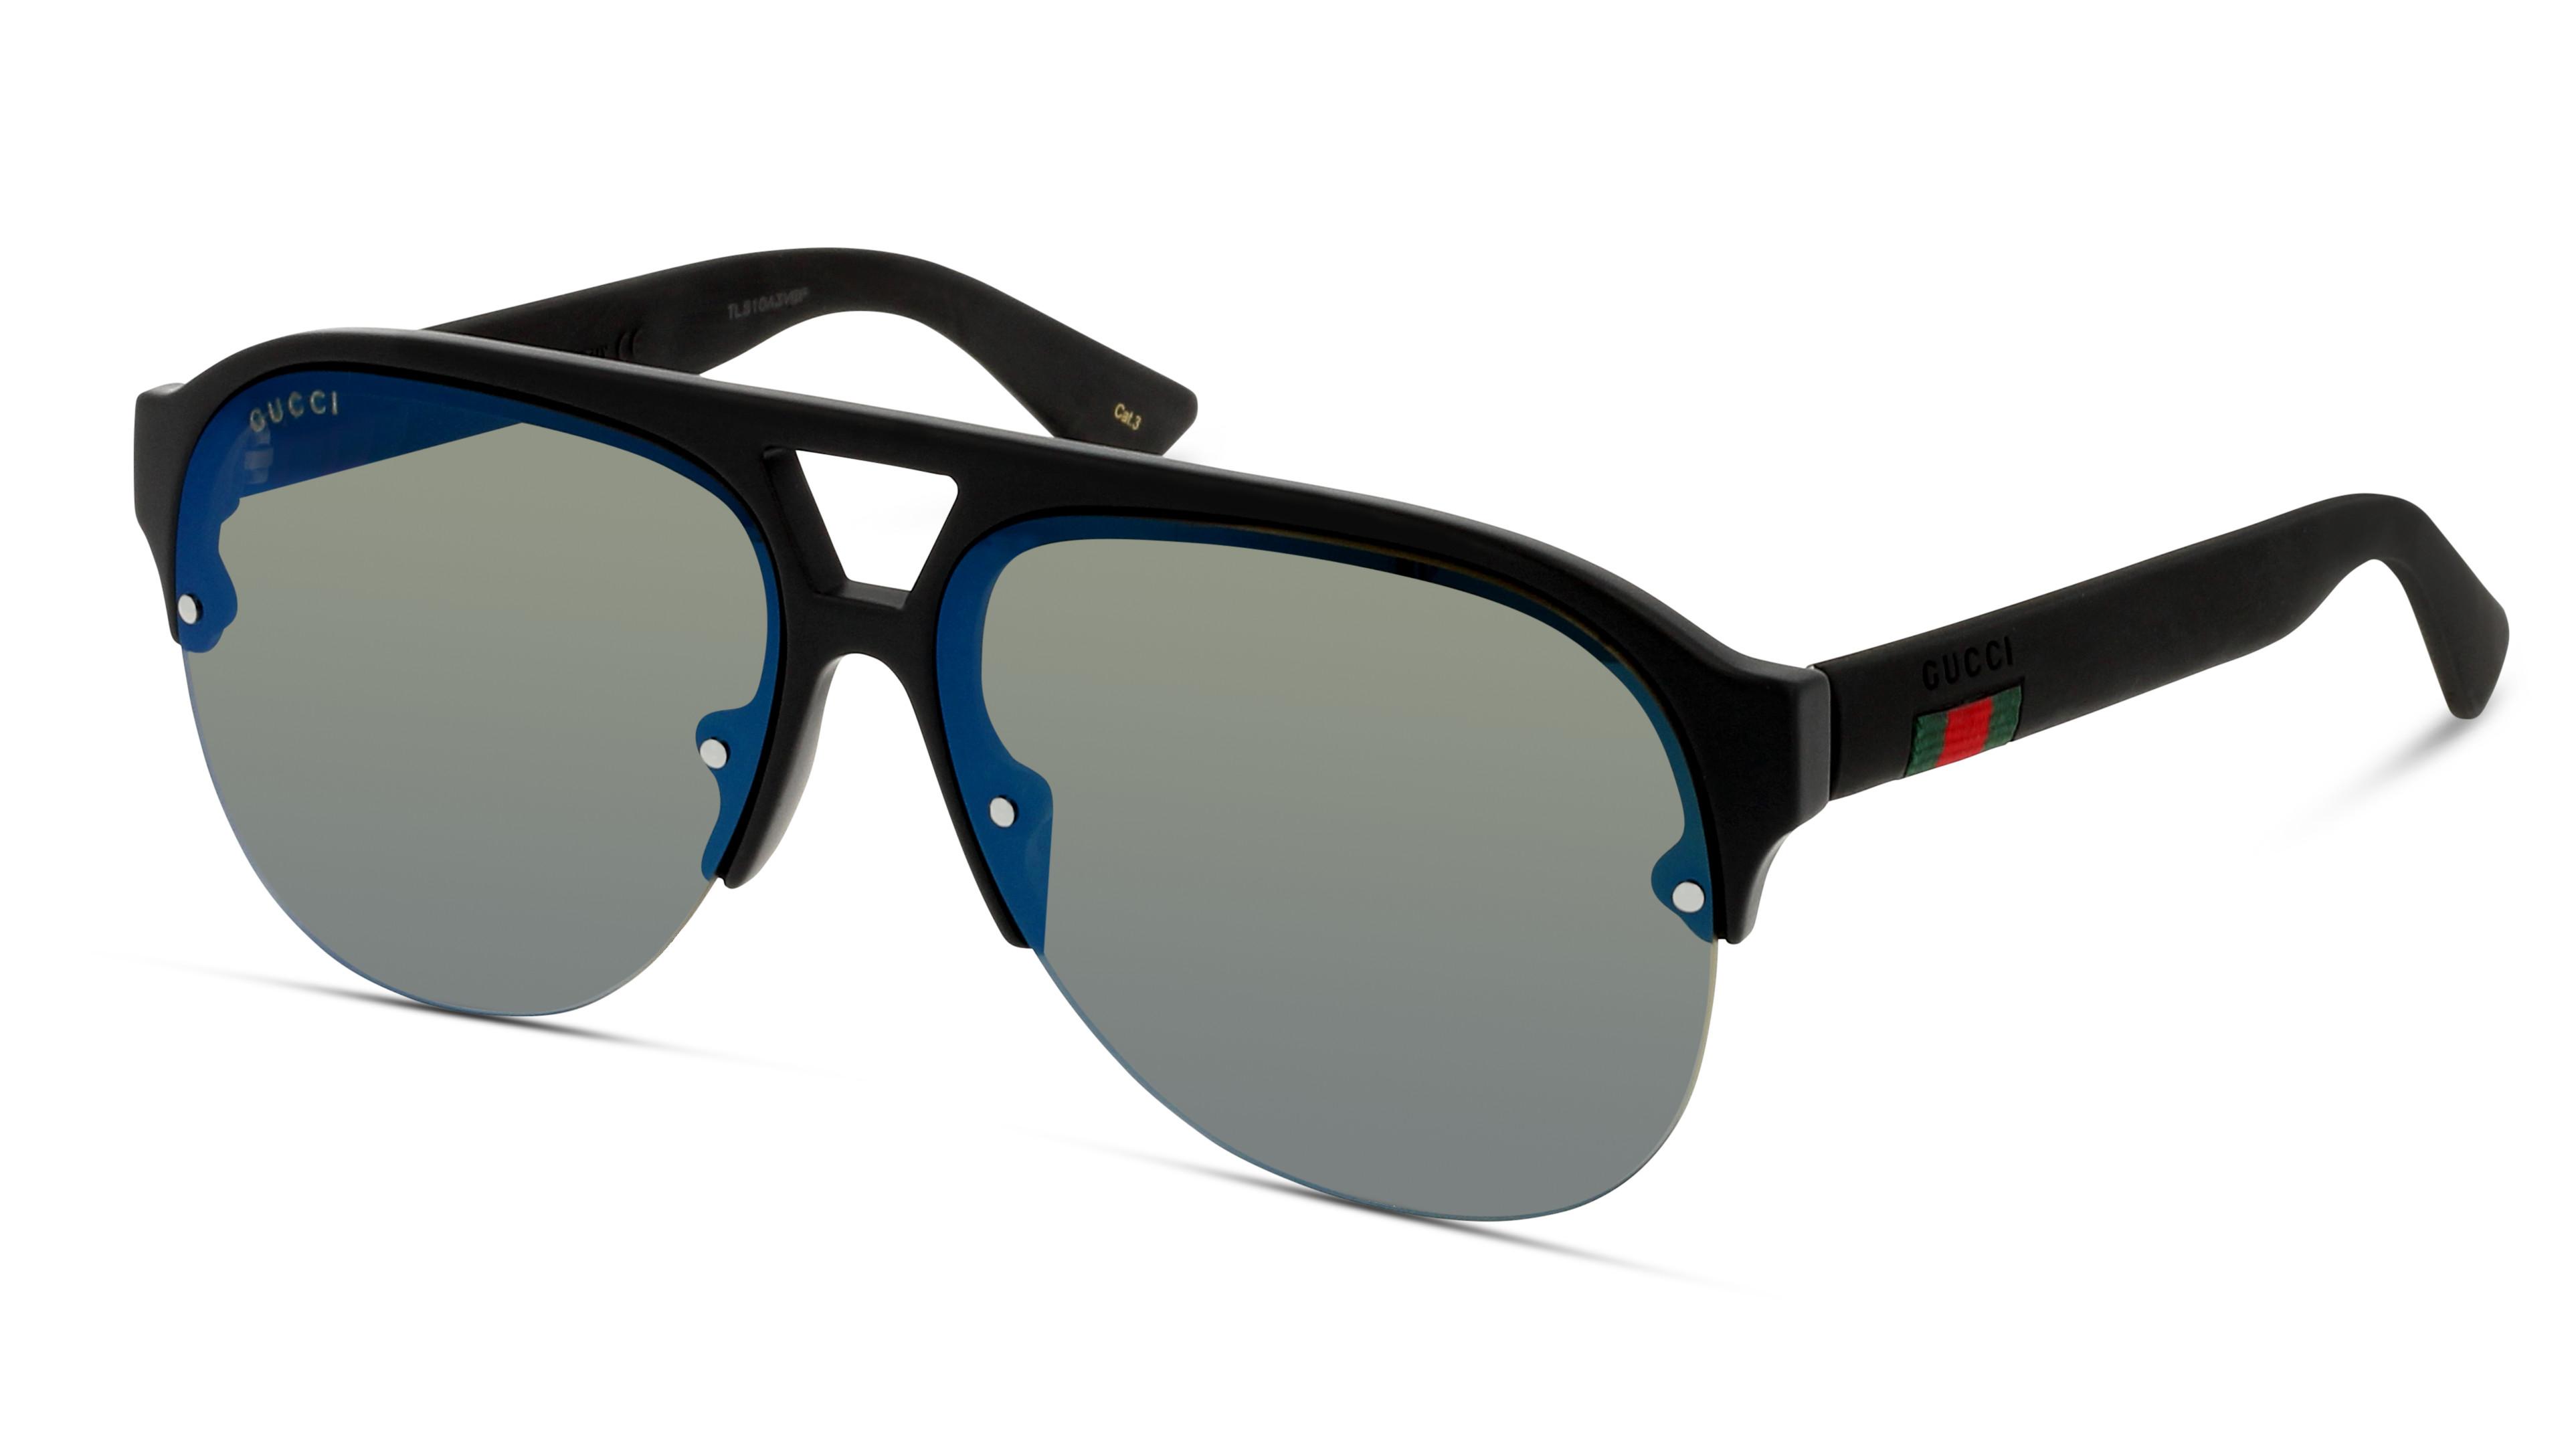 8056376091328-angle-03-gucci-gg0170s-eyewear-black-black-blue